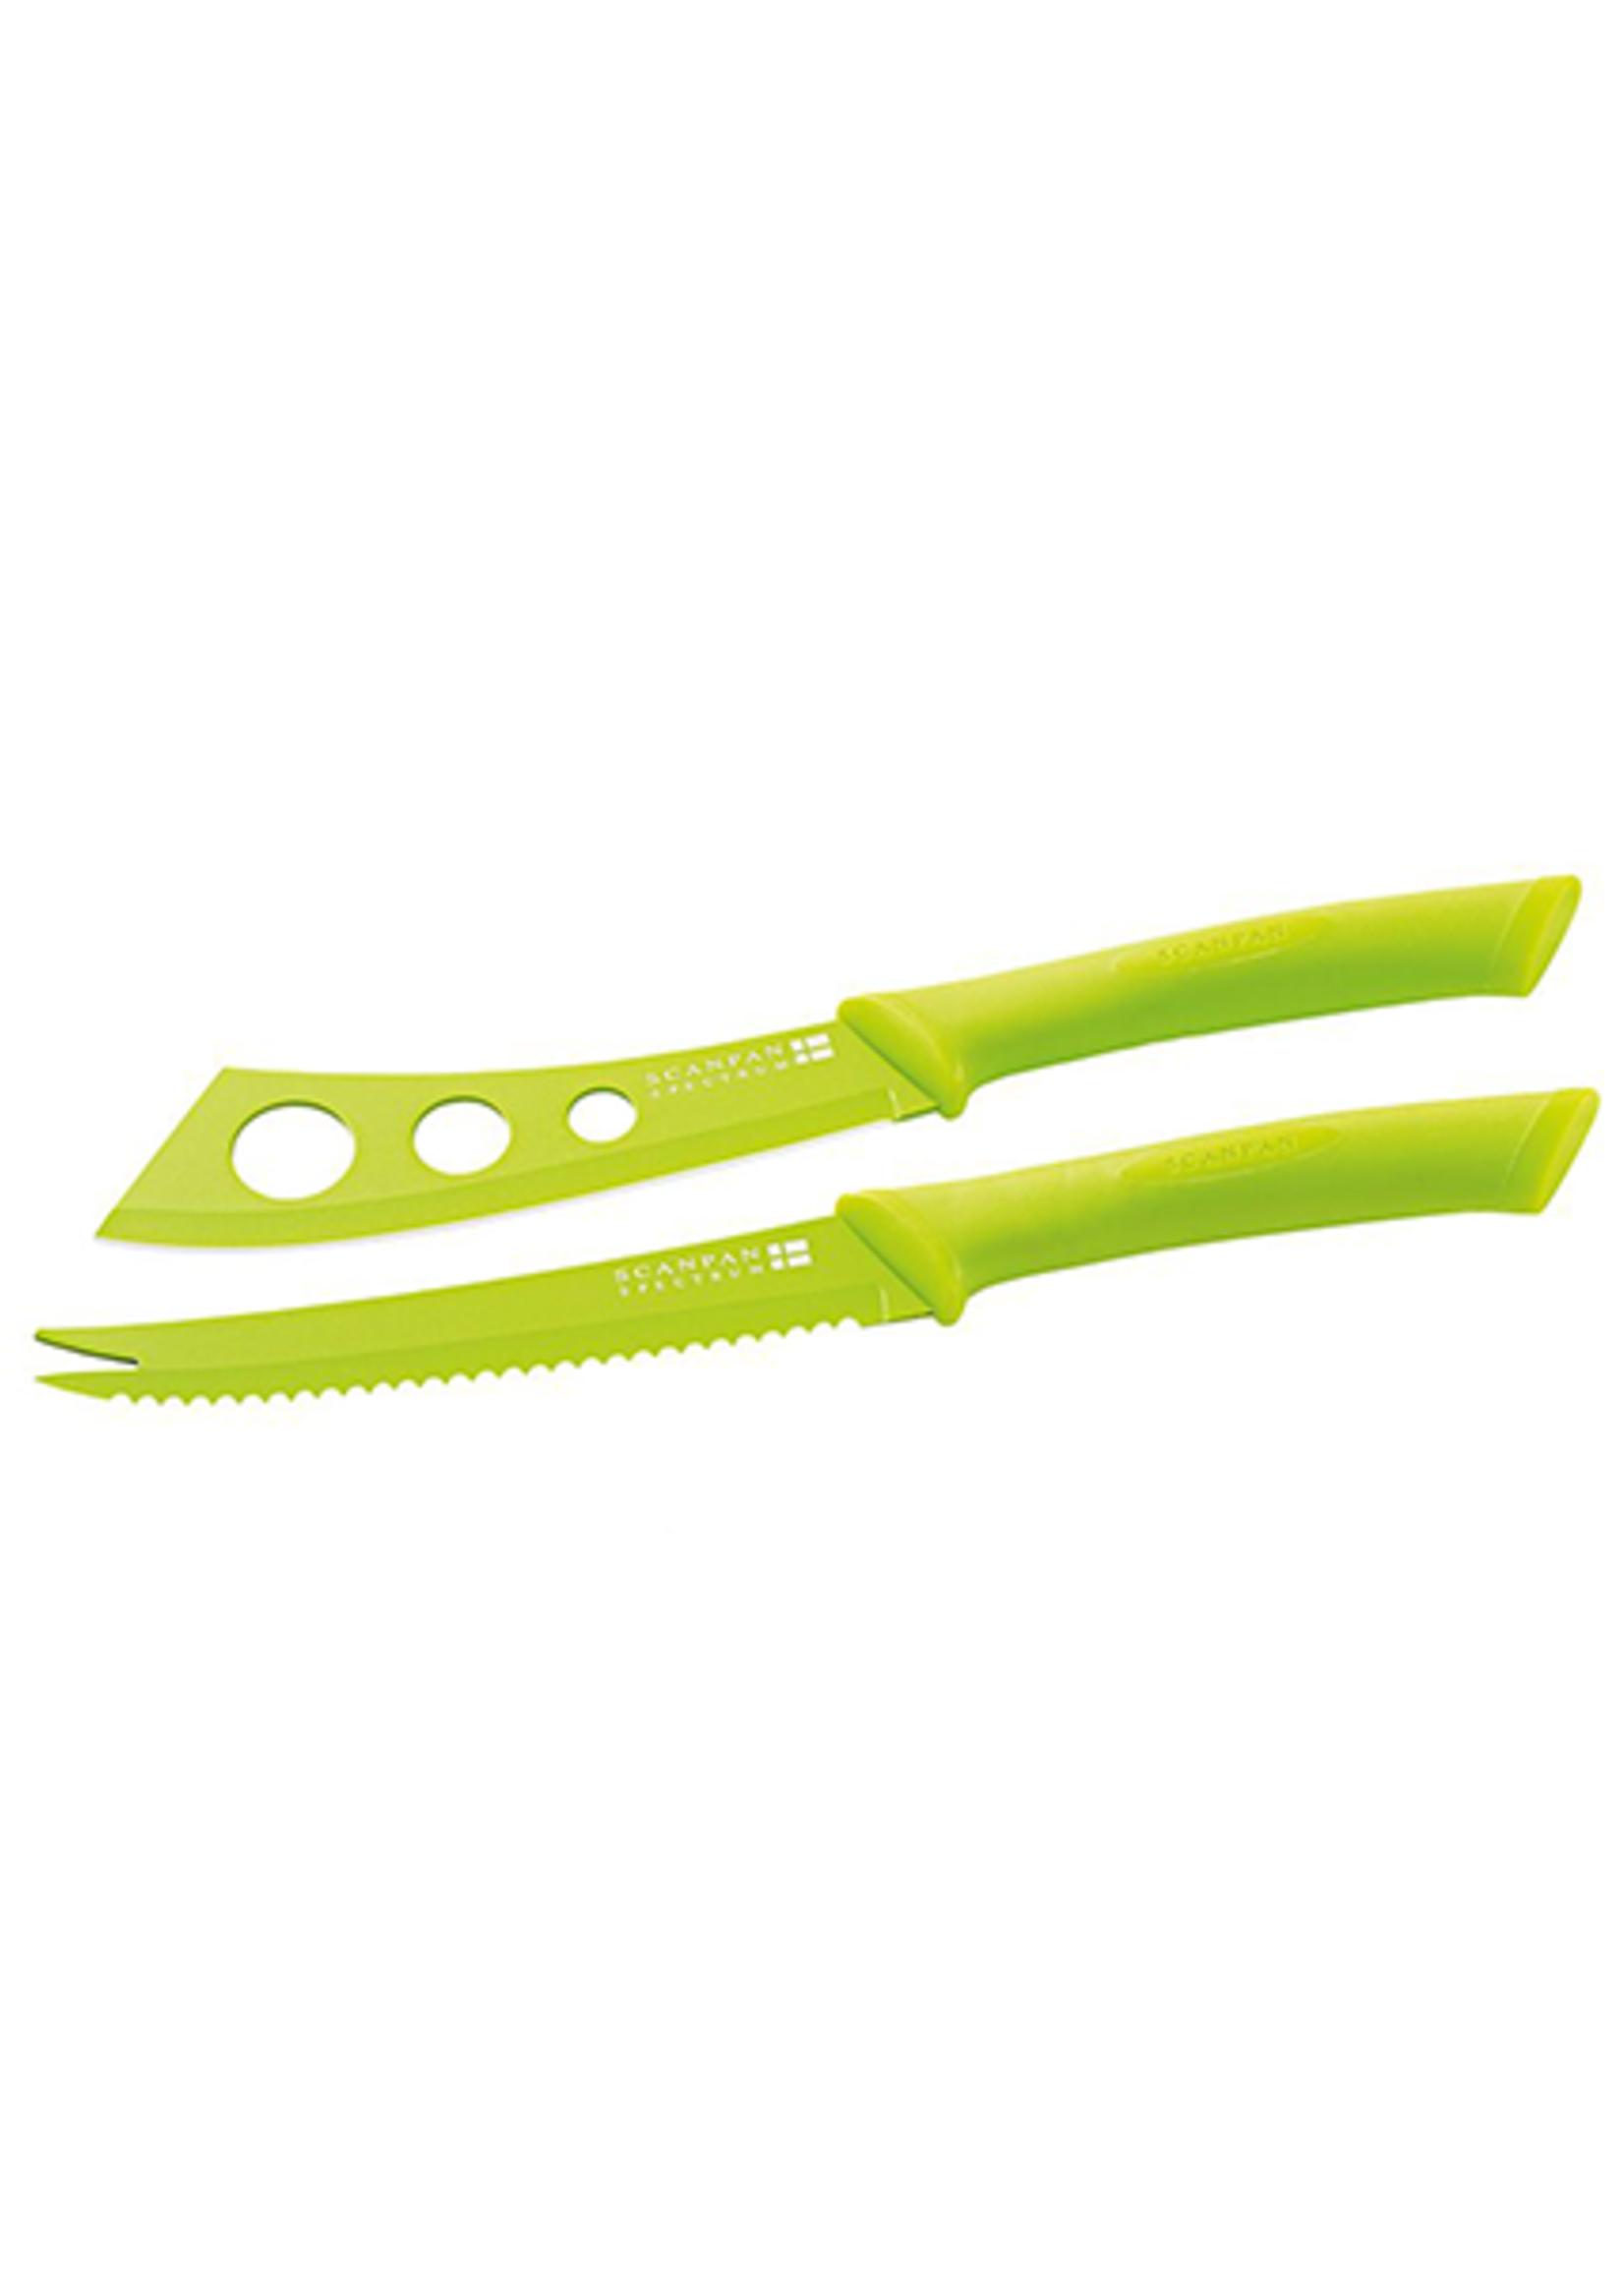 Spectrum Cheese Knife Set - Green